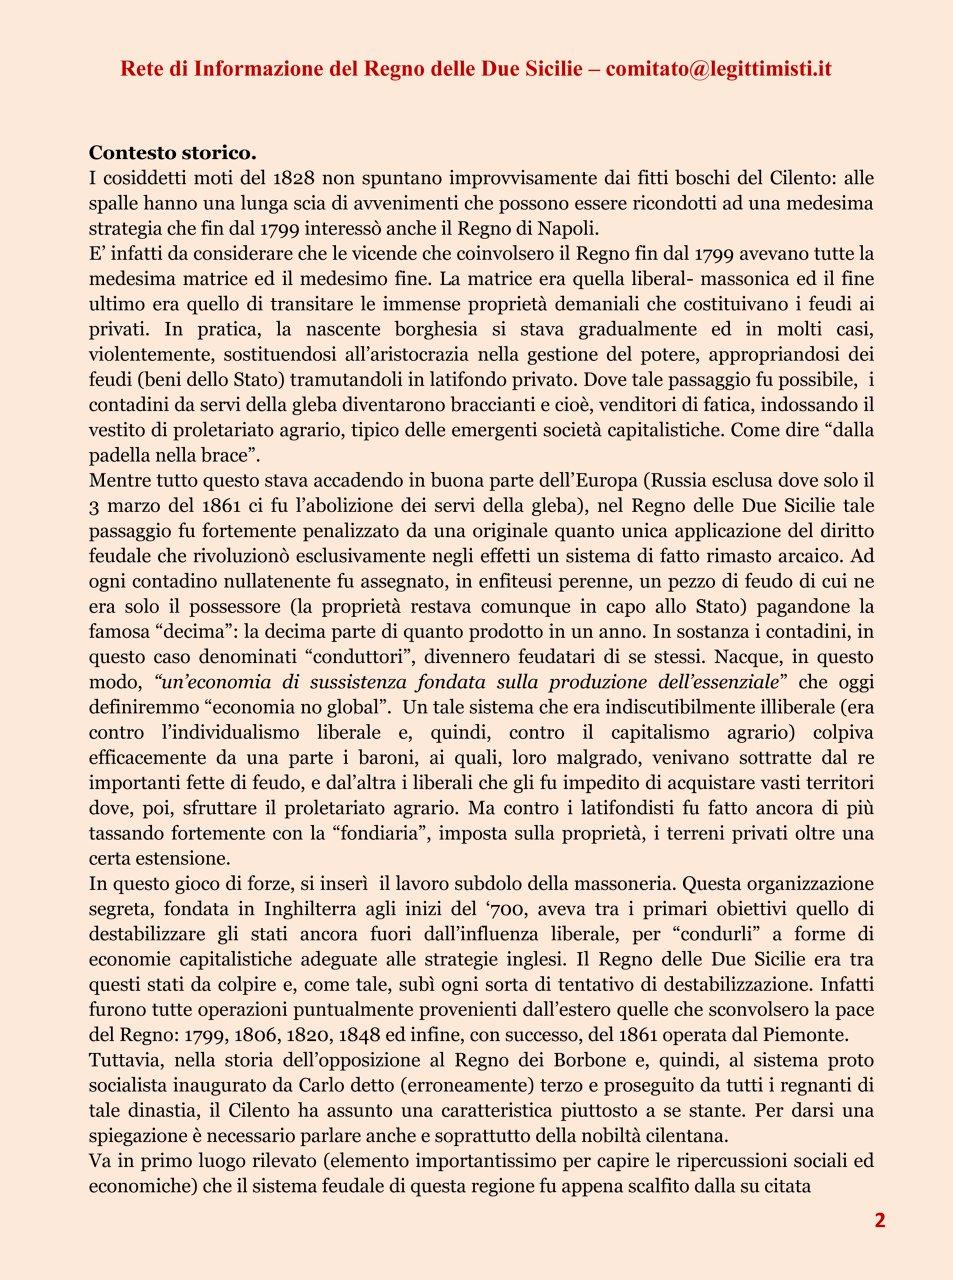 I Moti Cilentani del 1828 2#001